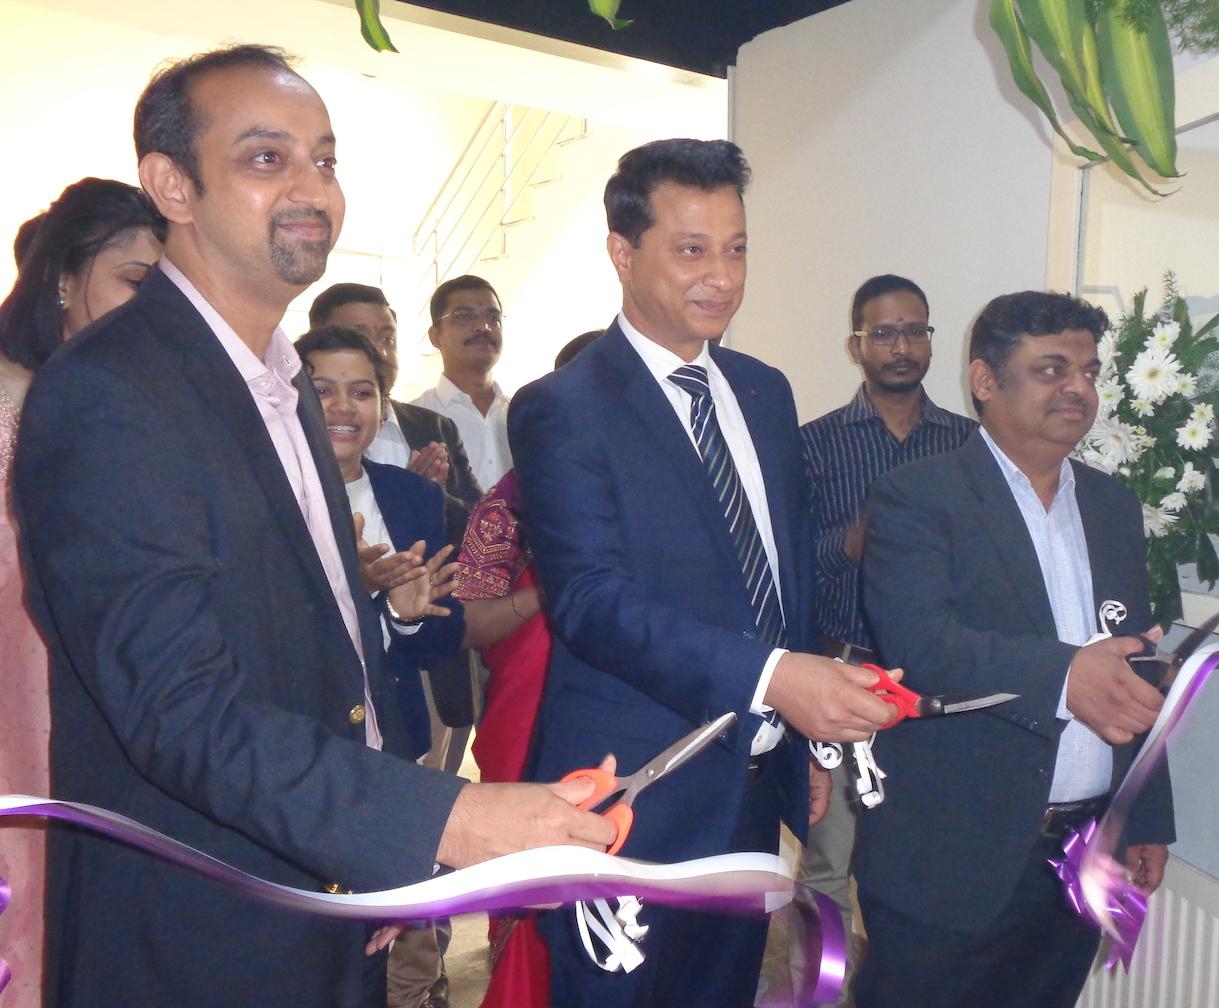 Ramanathan S, Rahul Uppal, Arun Verma, AAF International